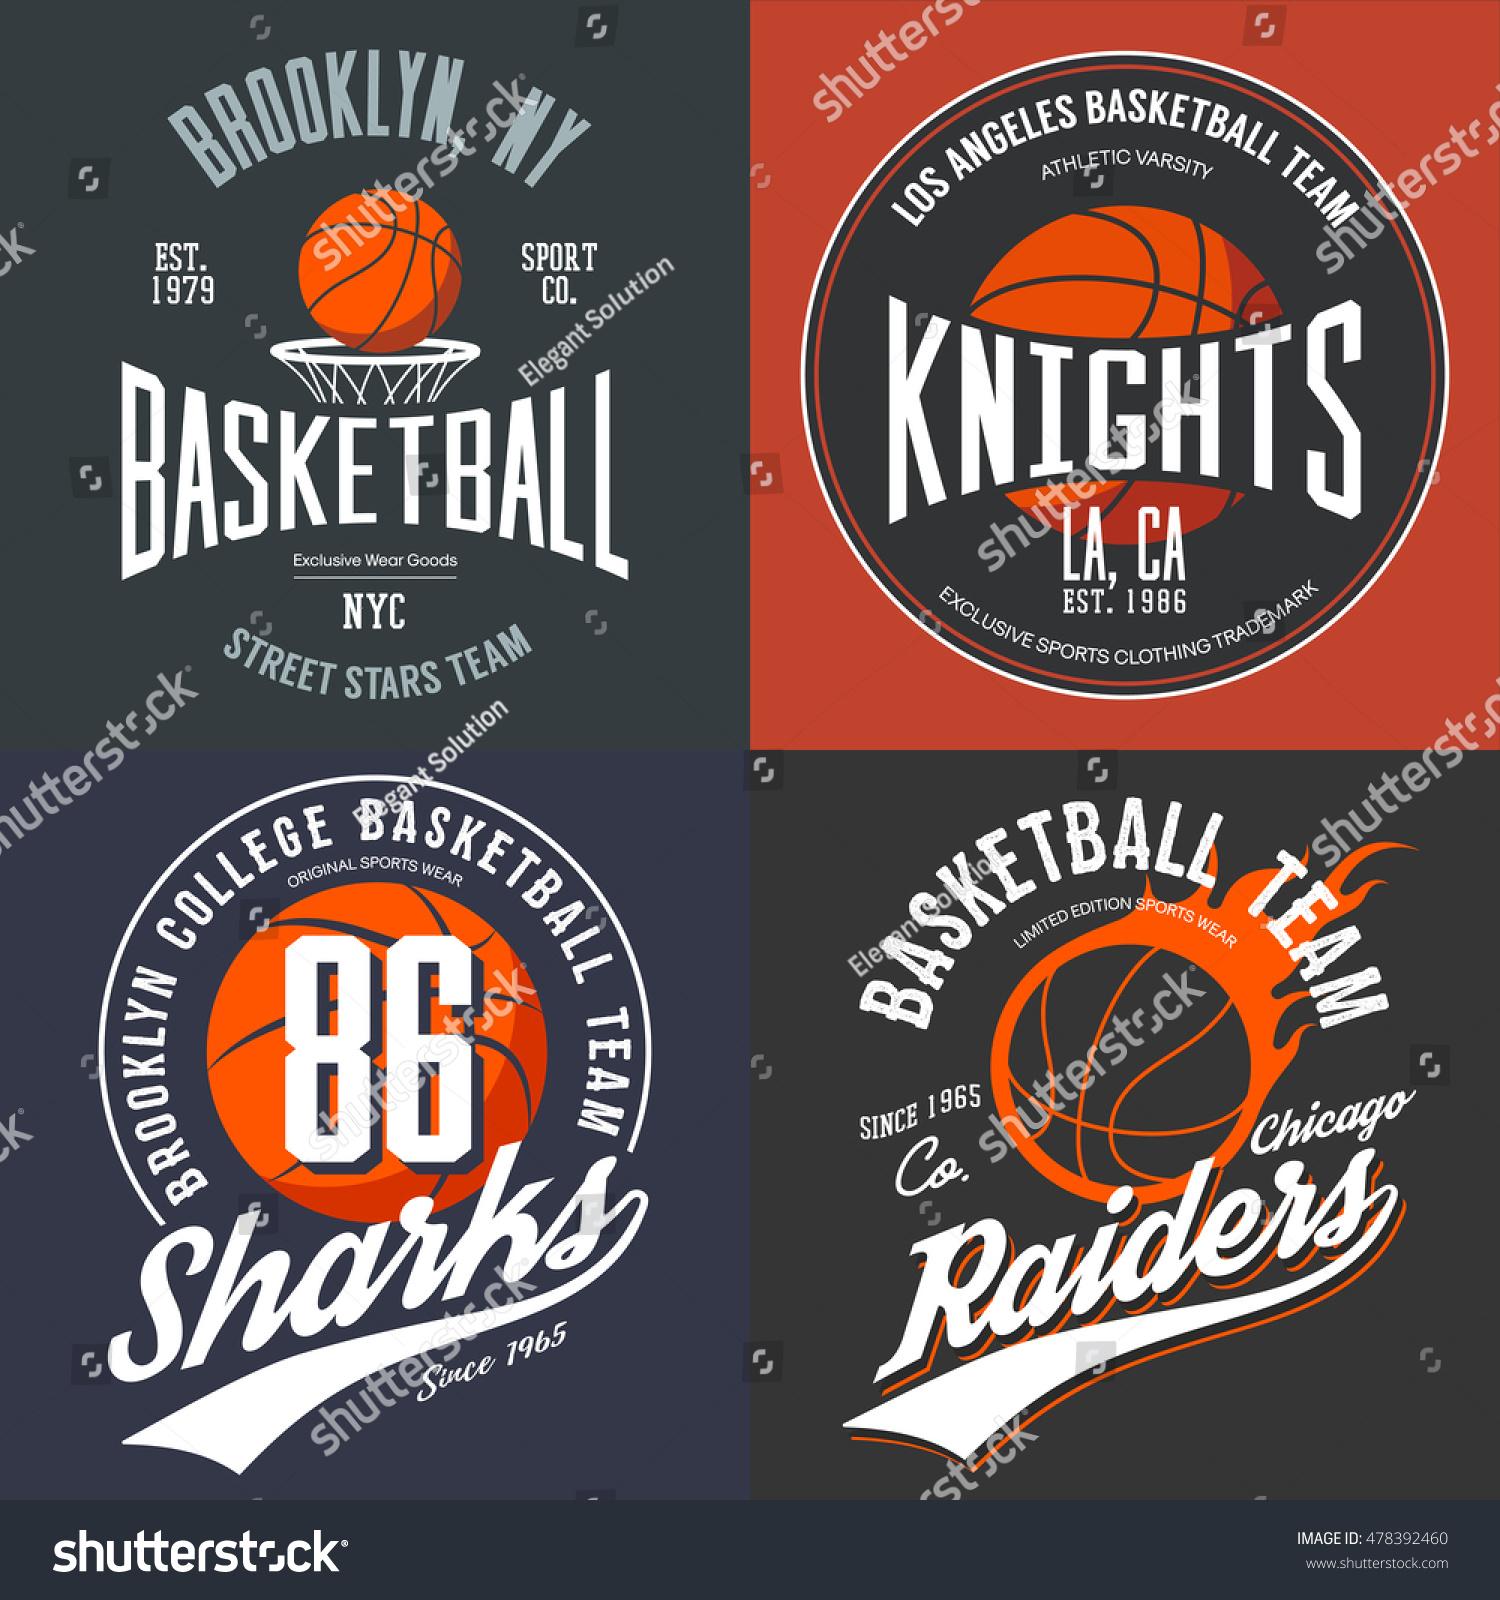 Shirt design usa - T Shirt Design For Basketball Fans For Usa New York Brooklyn Street Team Knights